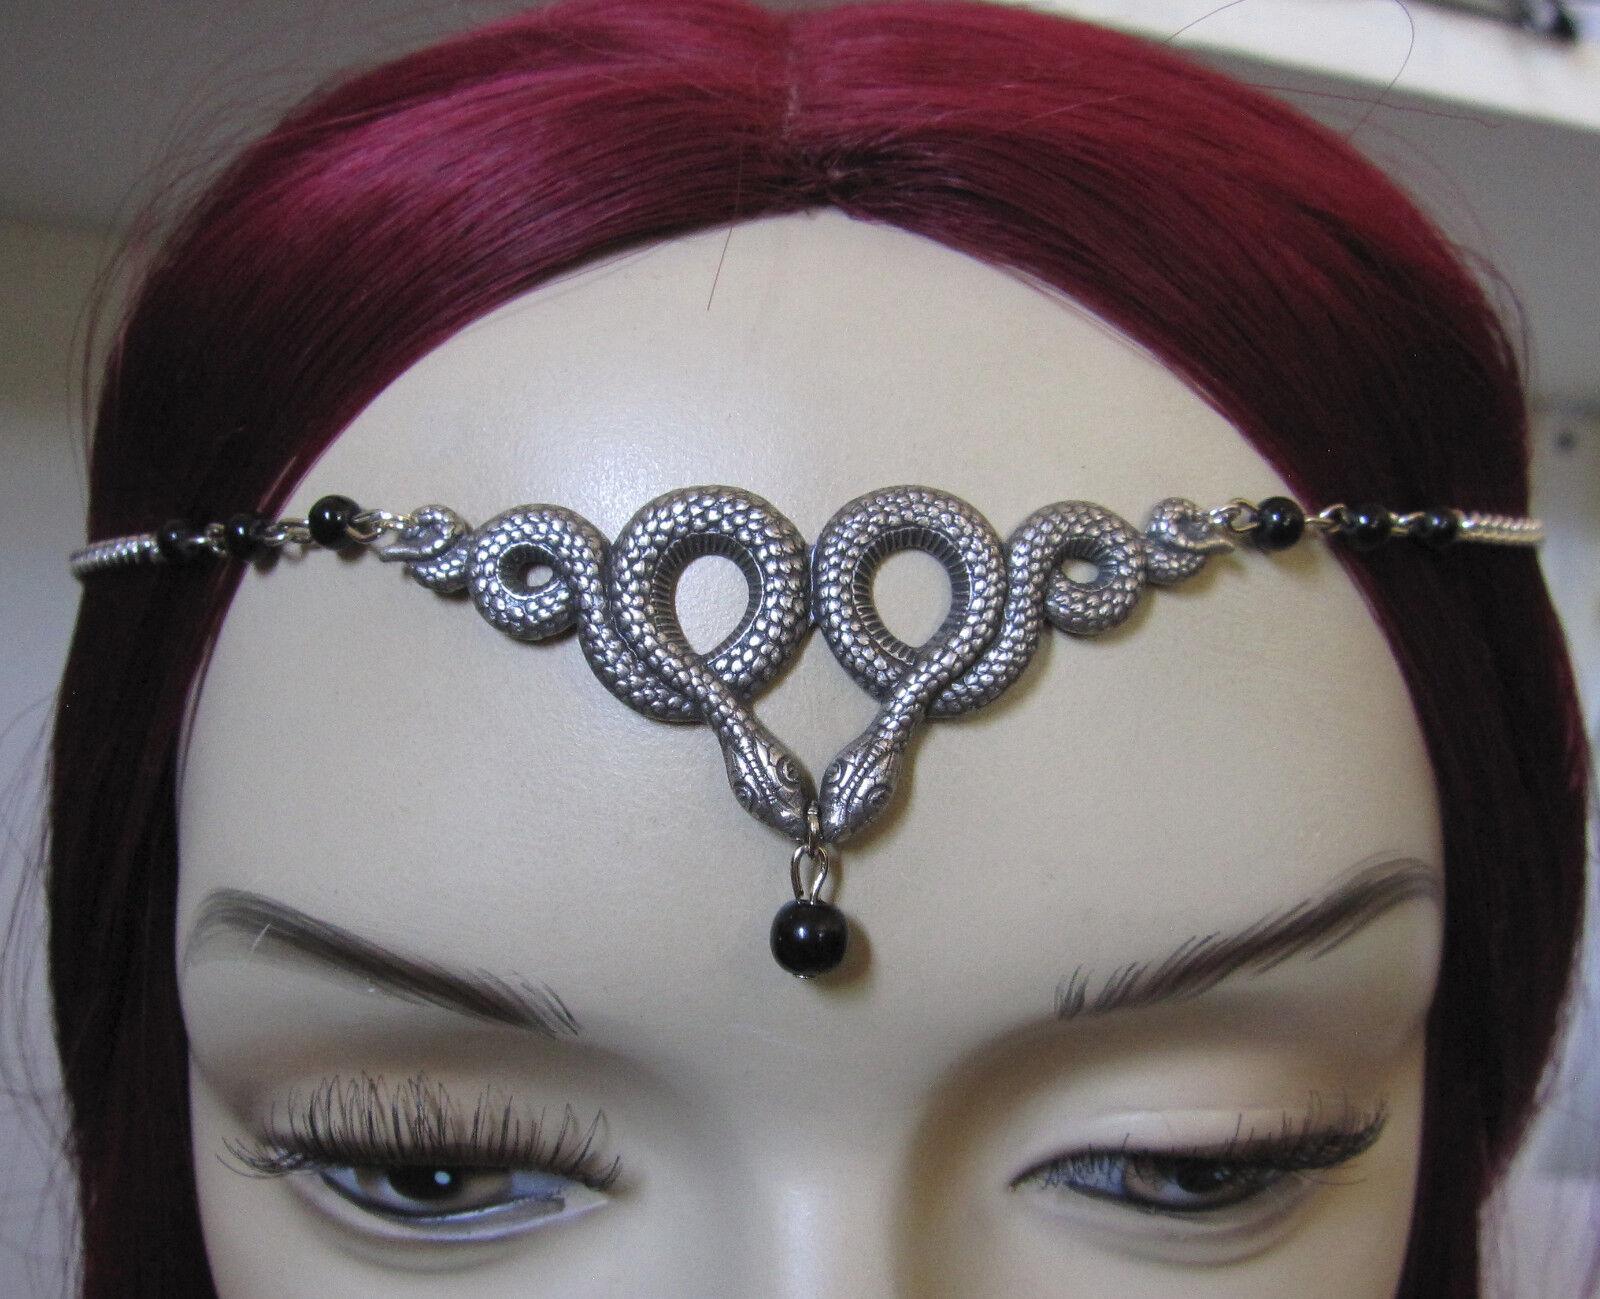 Gothic Renaissance Medieval Victorian Circlet Crown Headpiece Headdress Jewelry